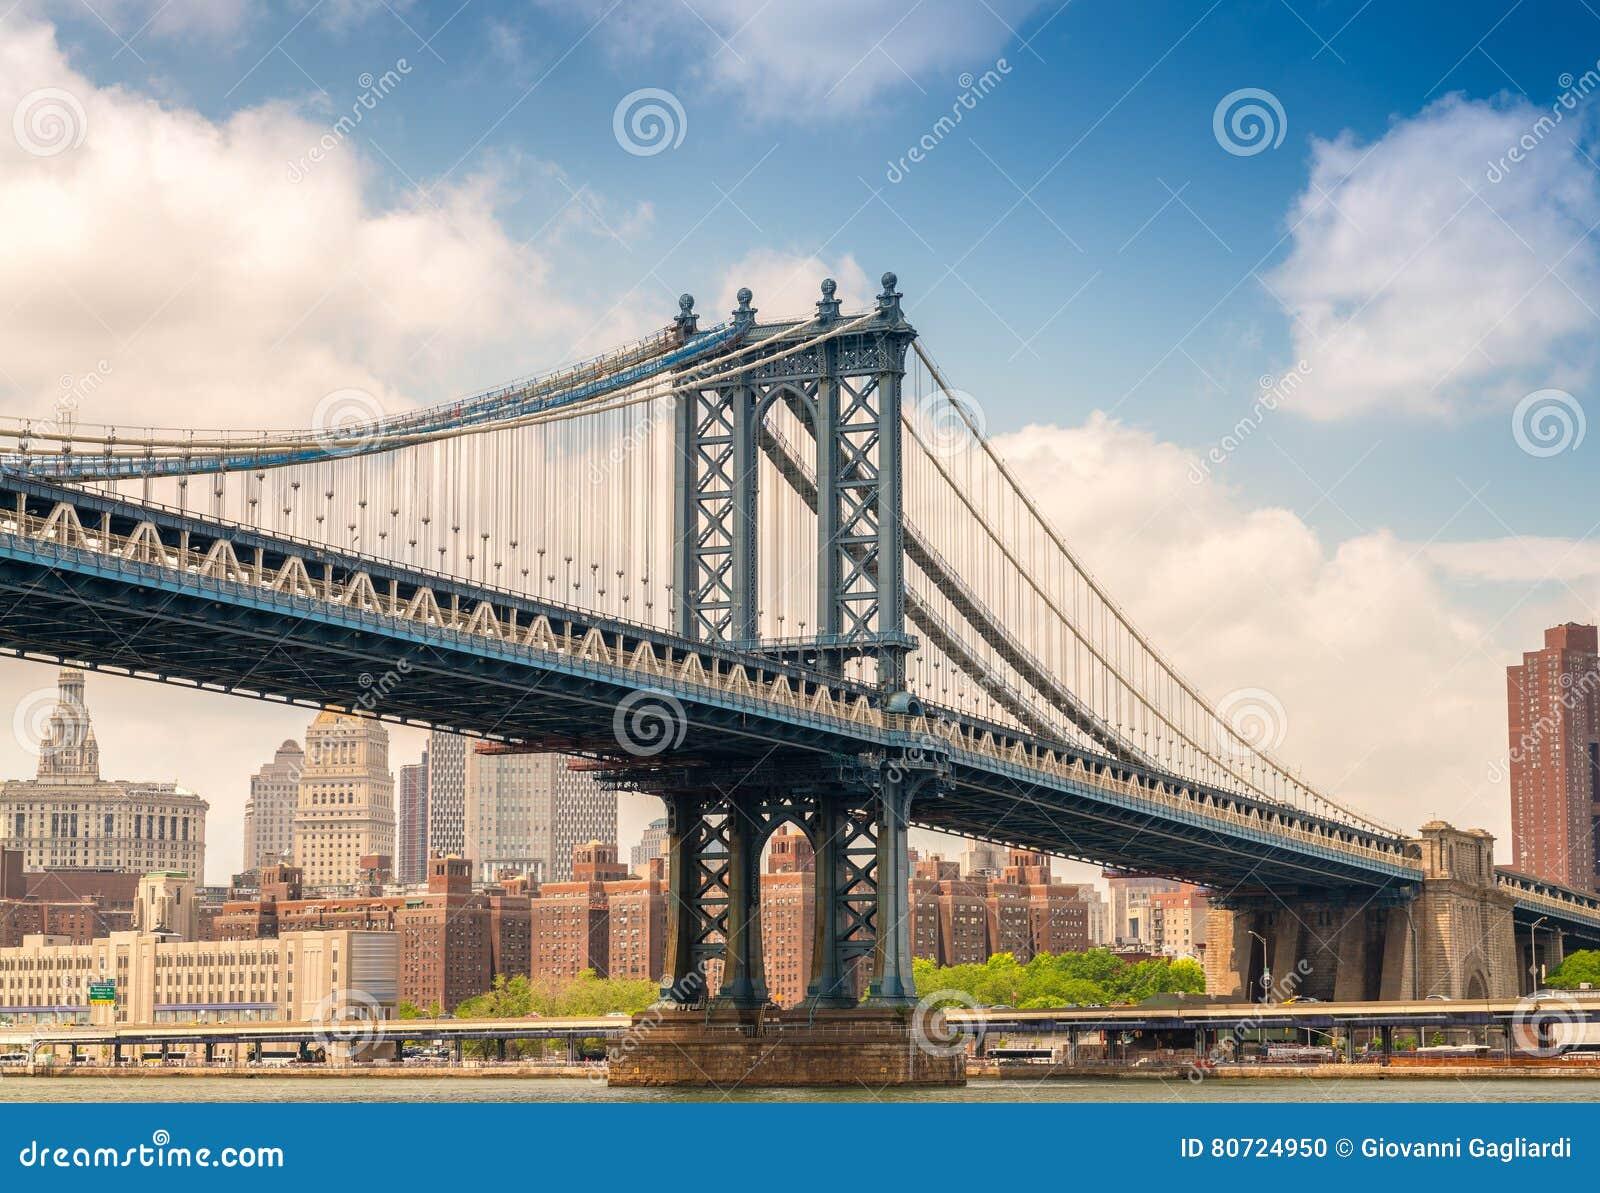 The Manhattan Bridge as seen from underneath, New York City